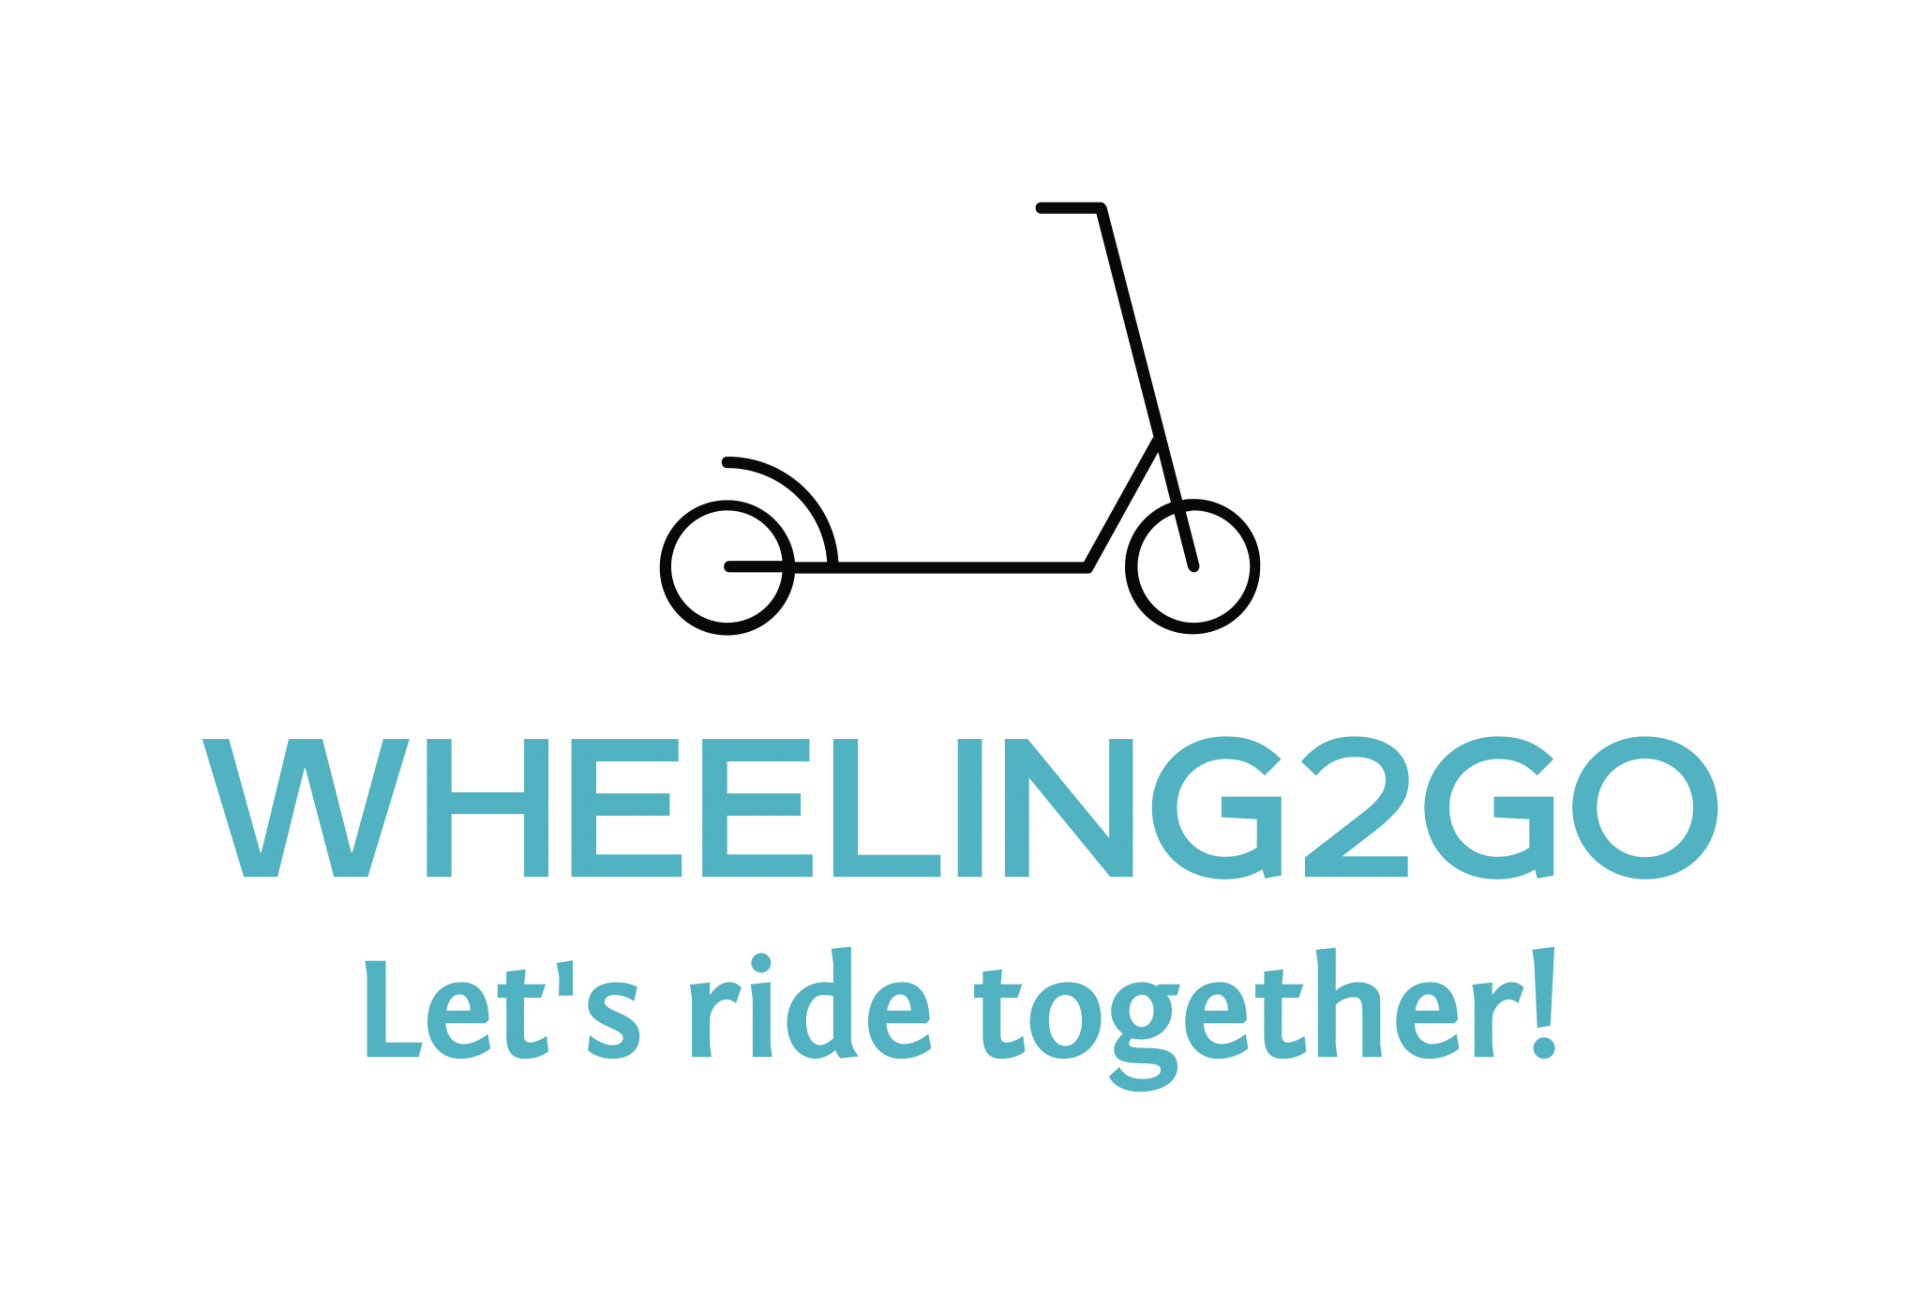 Wheeling2Go